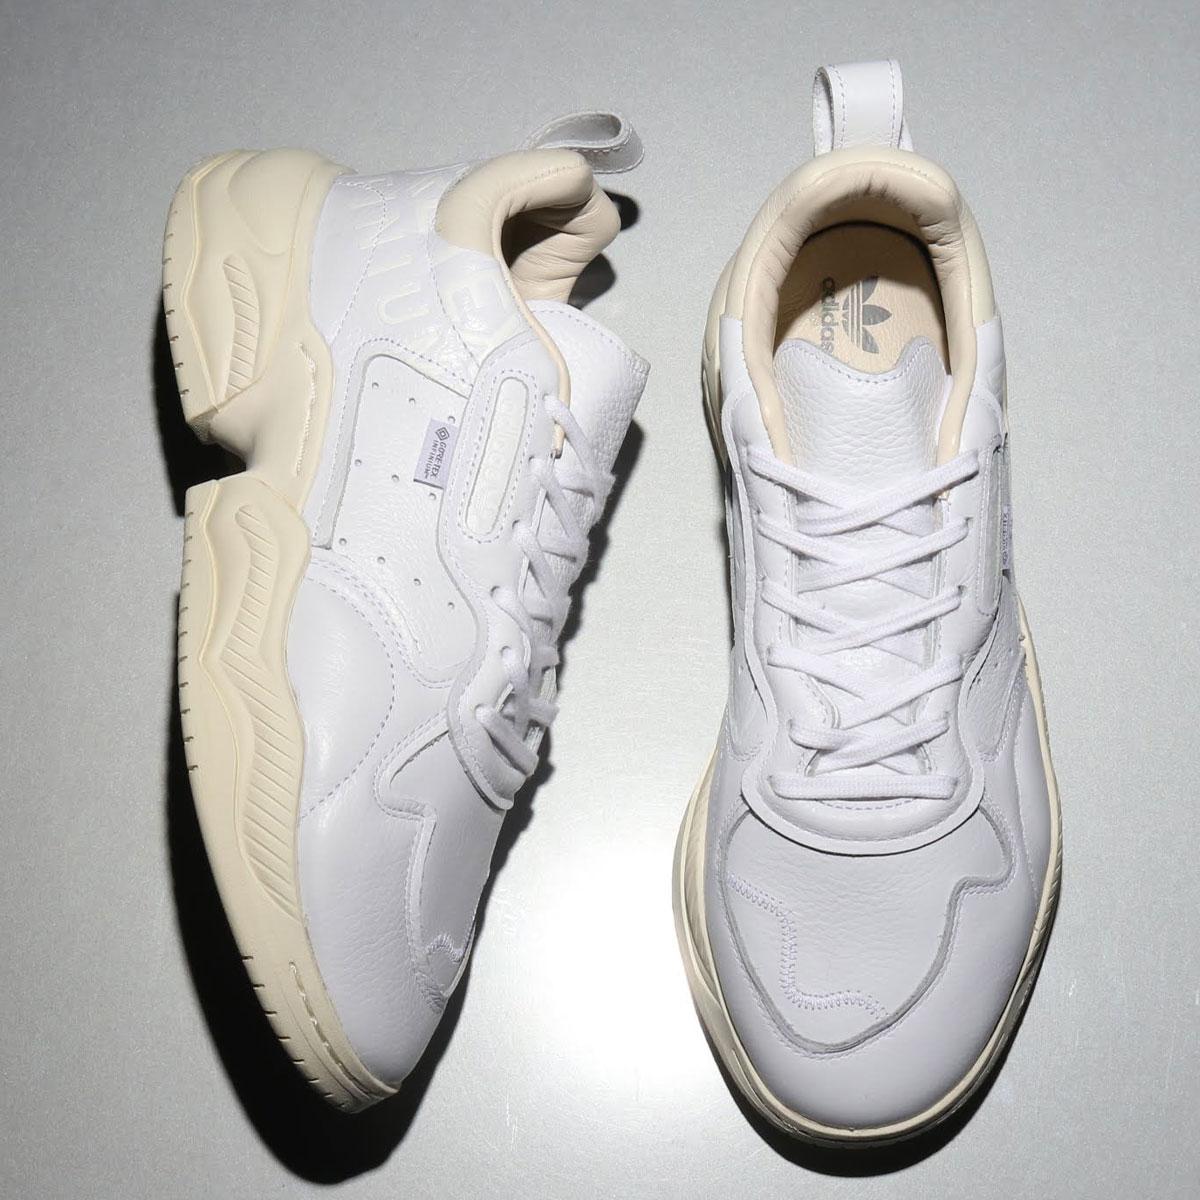 adidas SUPERCOURT RX GORE-TEX(アディダス スーパーコート RX)RUNNING WHITE/OFF WHITE/CHORK WHITE【メンズ レディース スニーカー】19FW-S